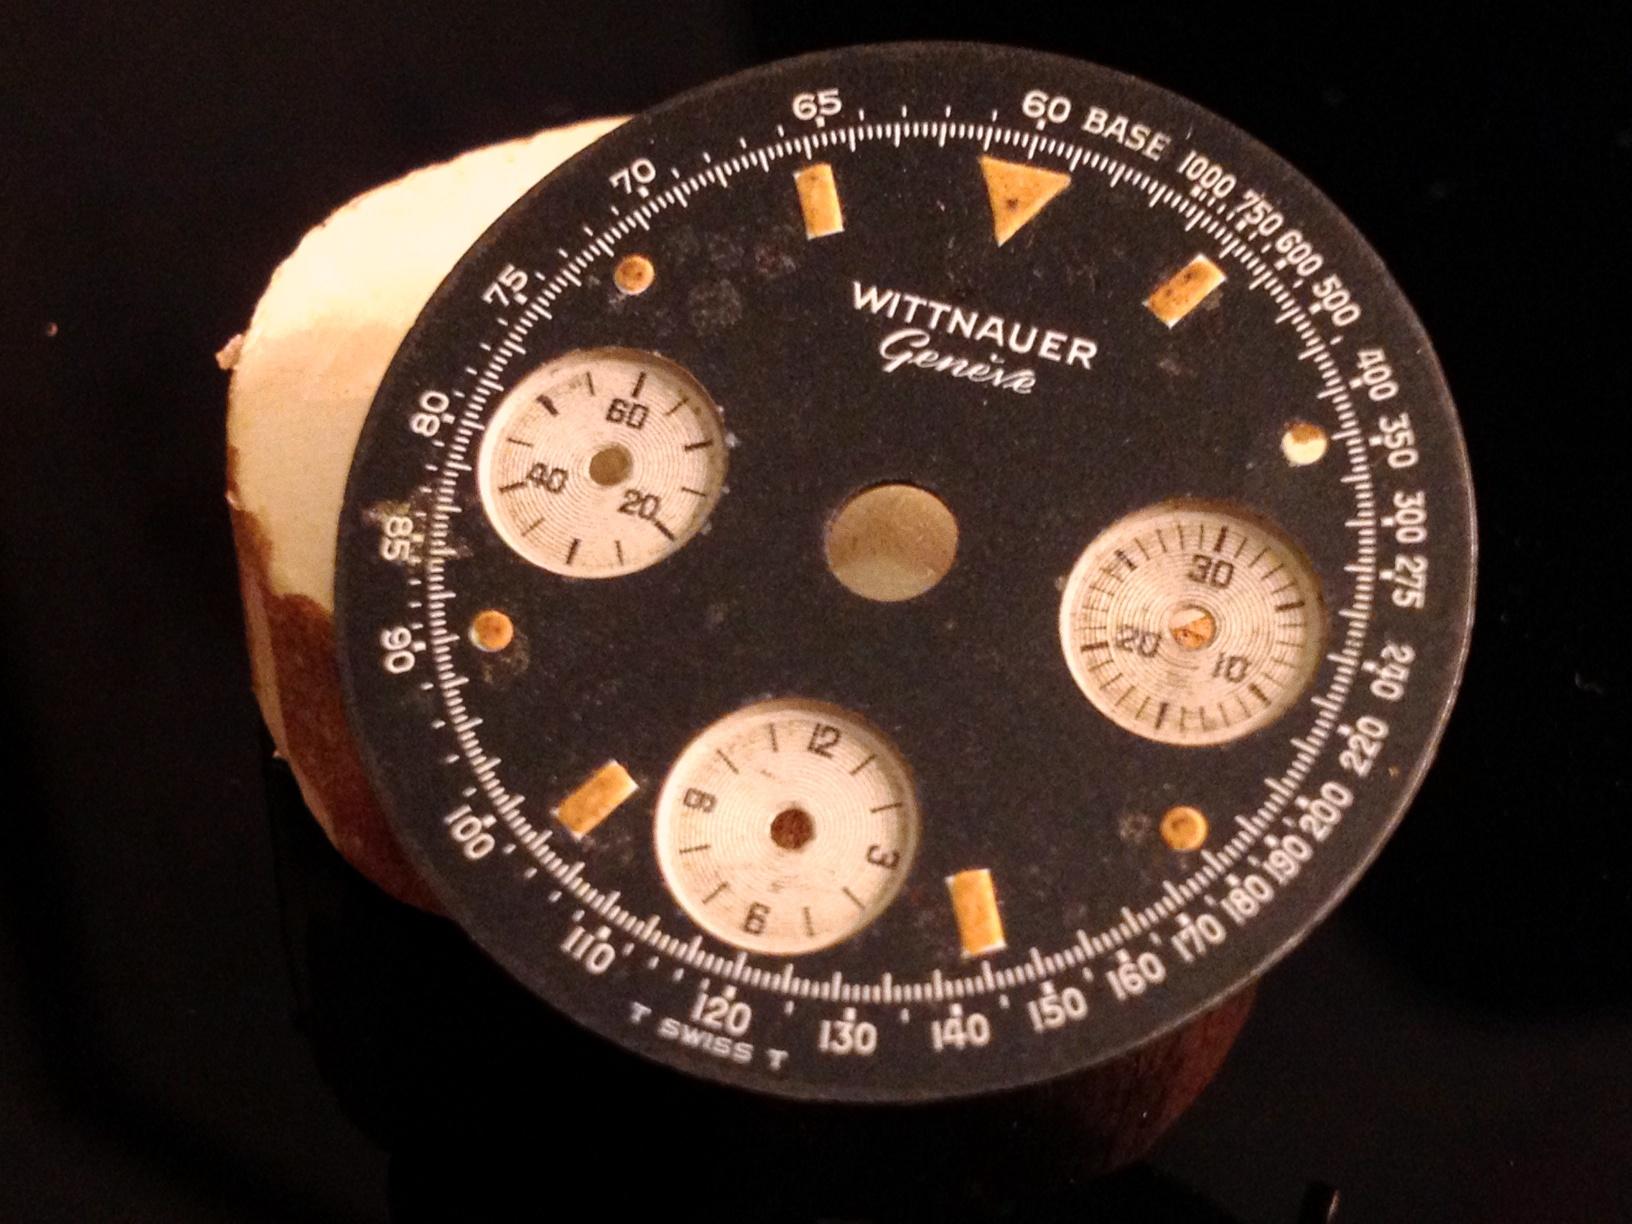 Wittnauer Valjoux 72 Black Dial 075